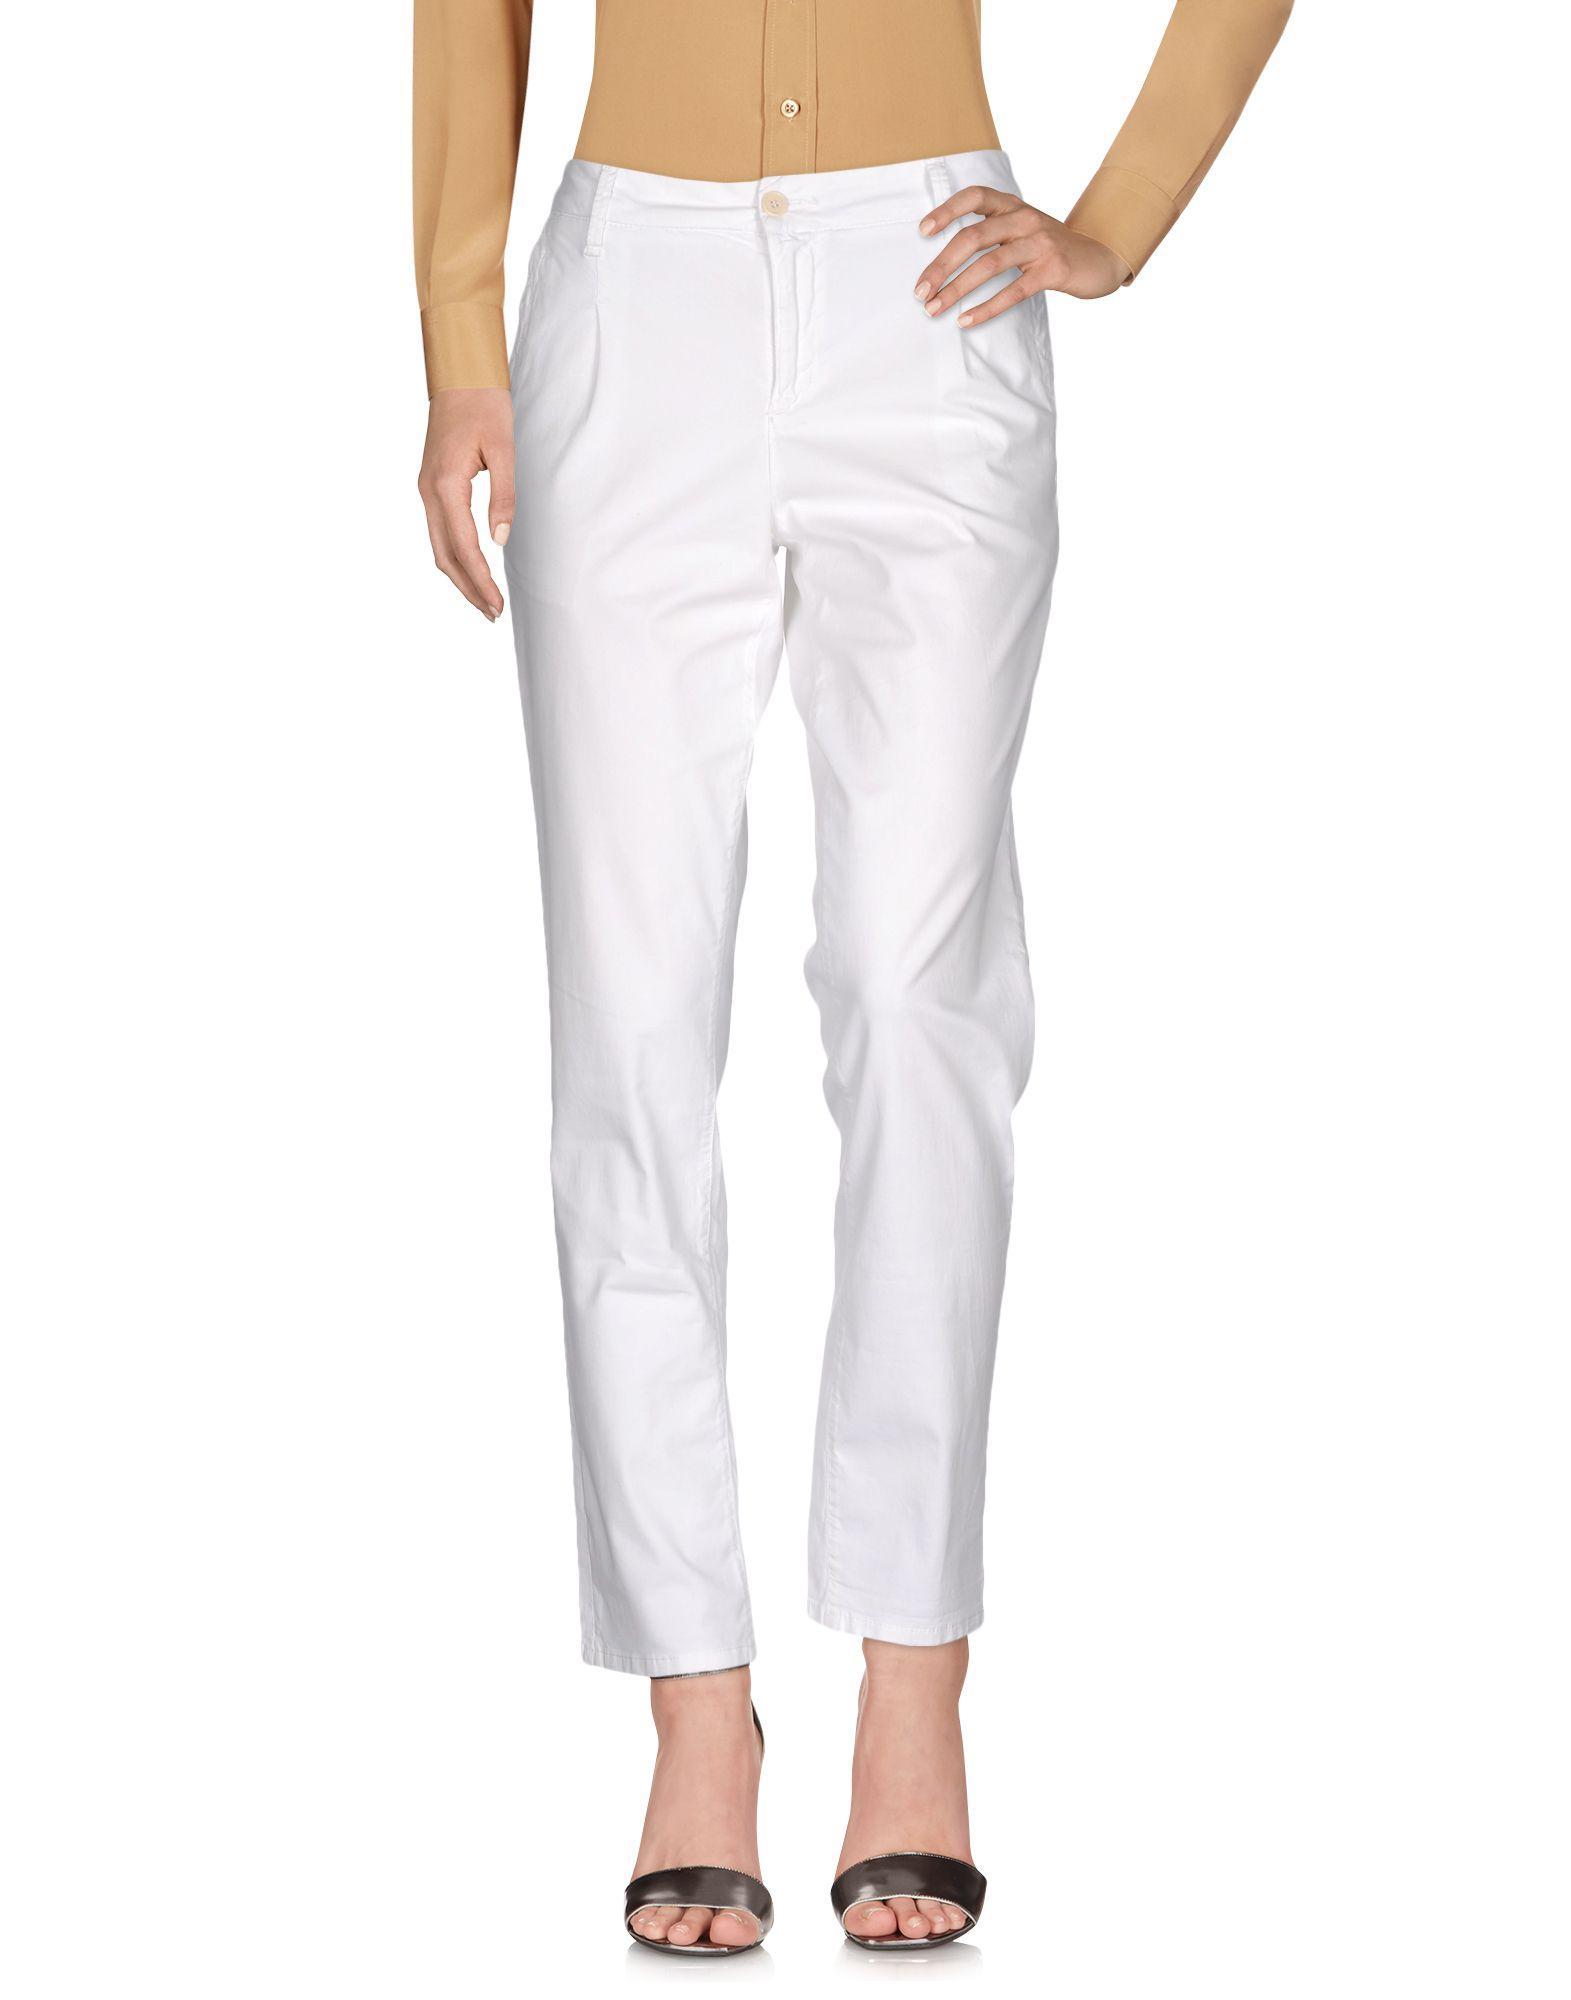 Liu •jo Casual Pants In White